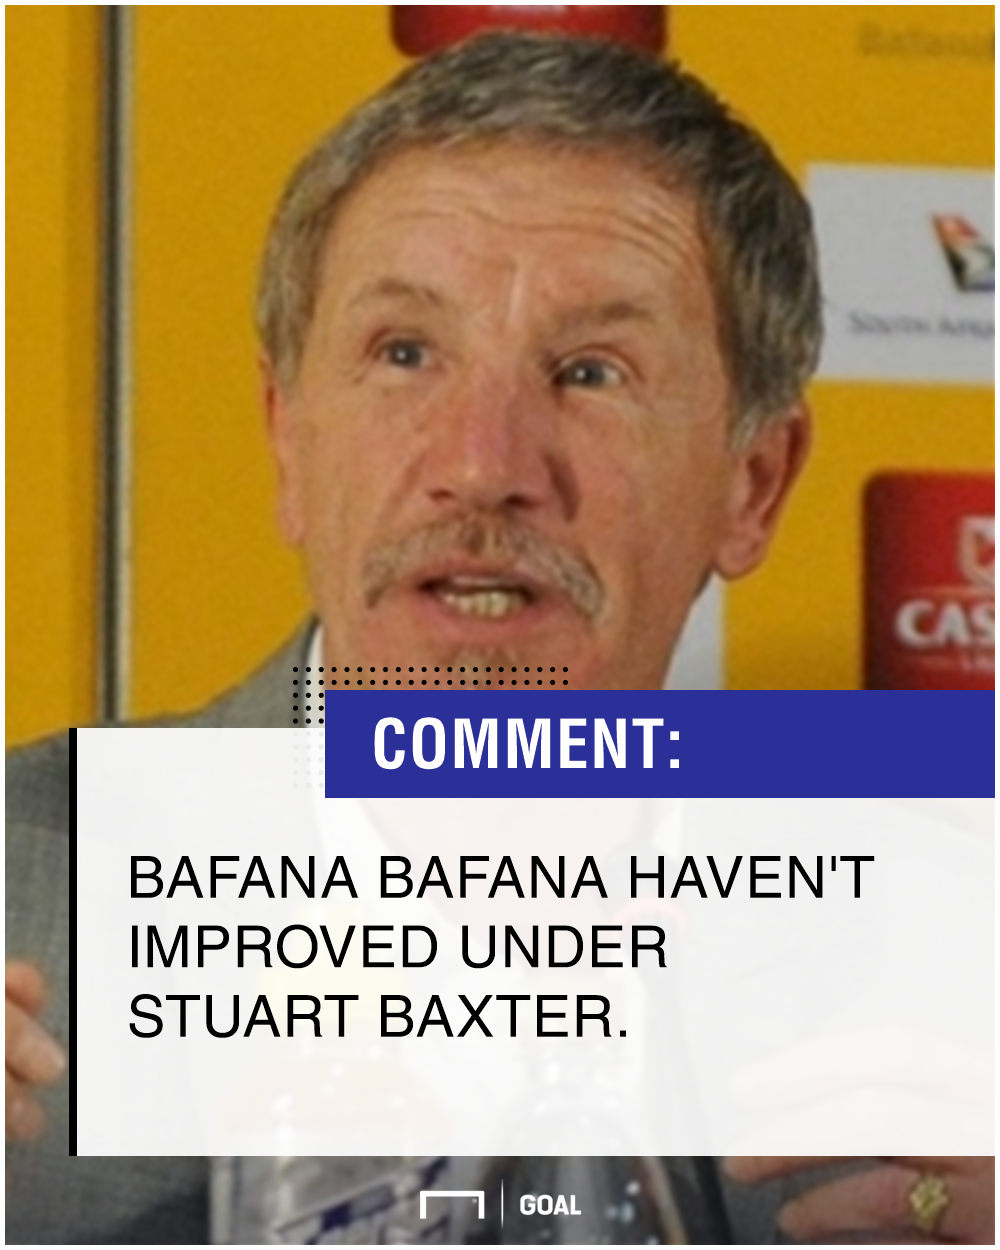 Bafana Bafana Stuart Baxter